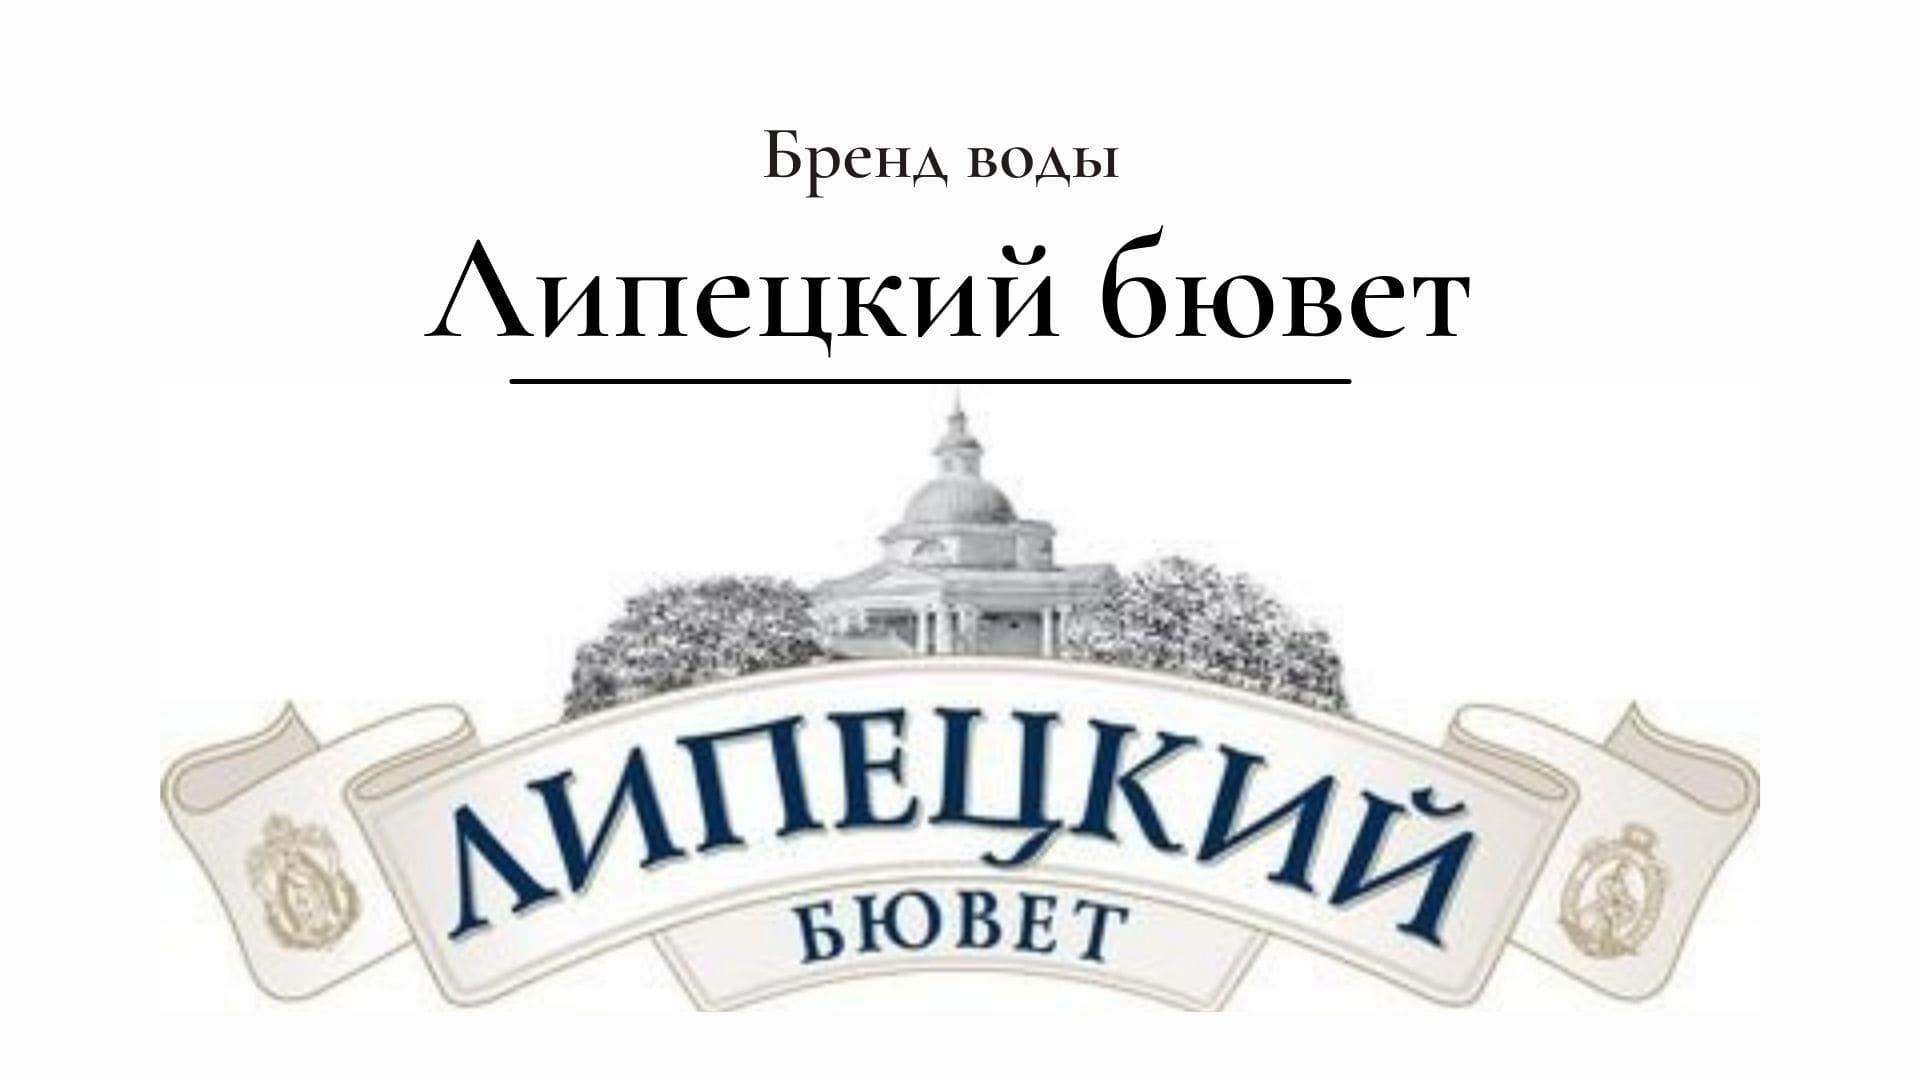 Бренд Липецкий бювет